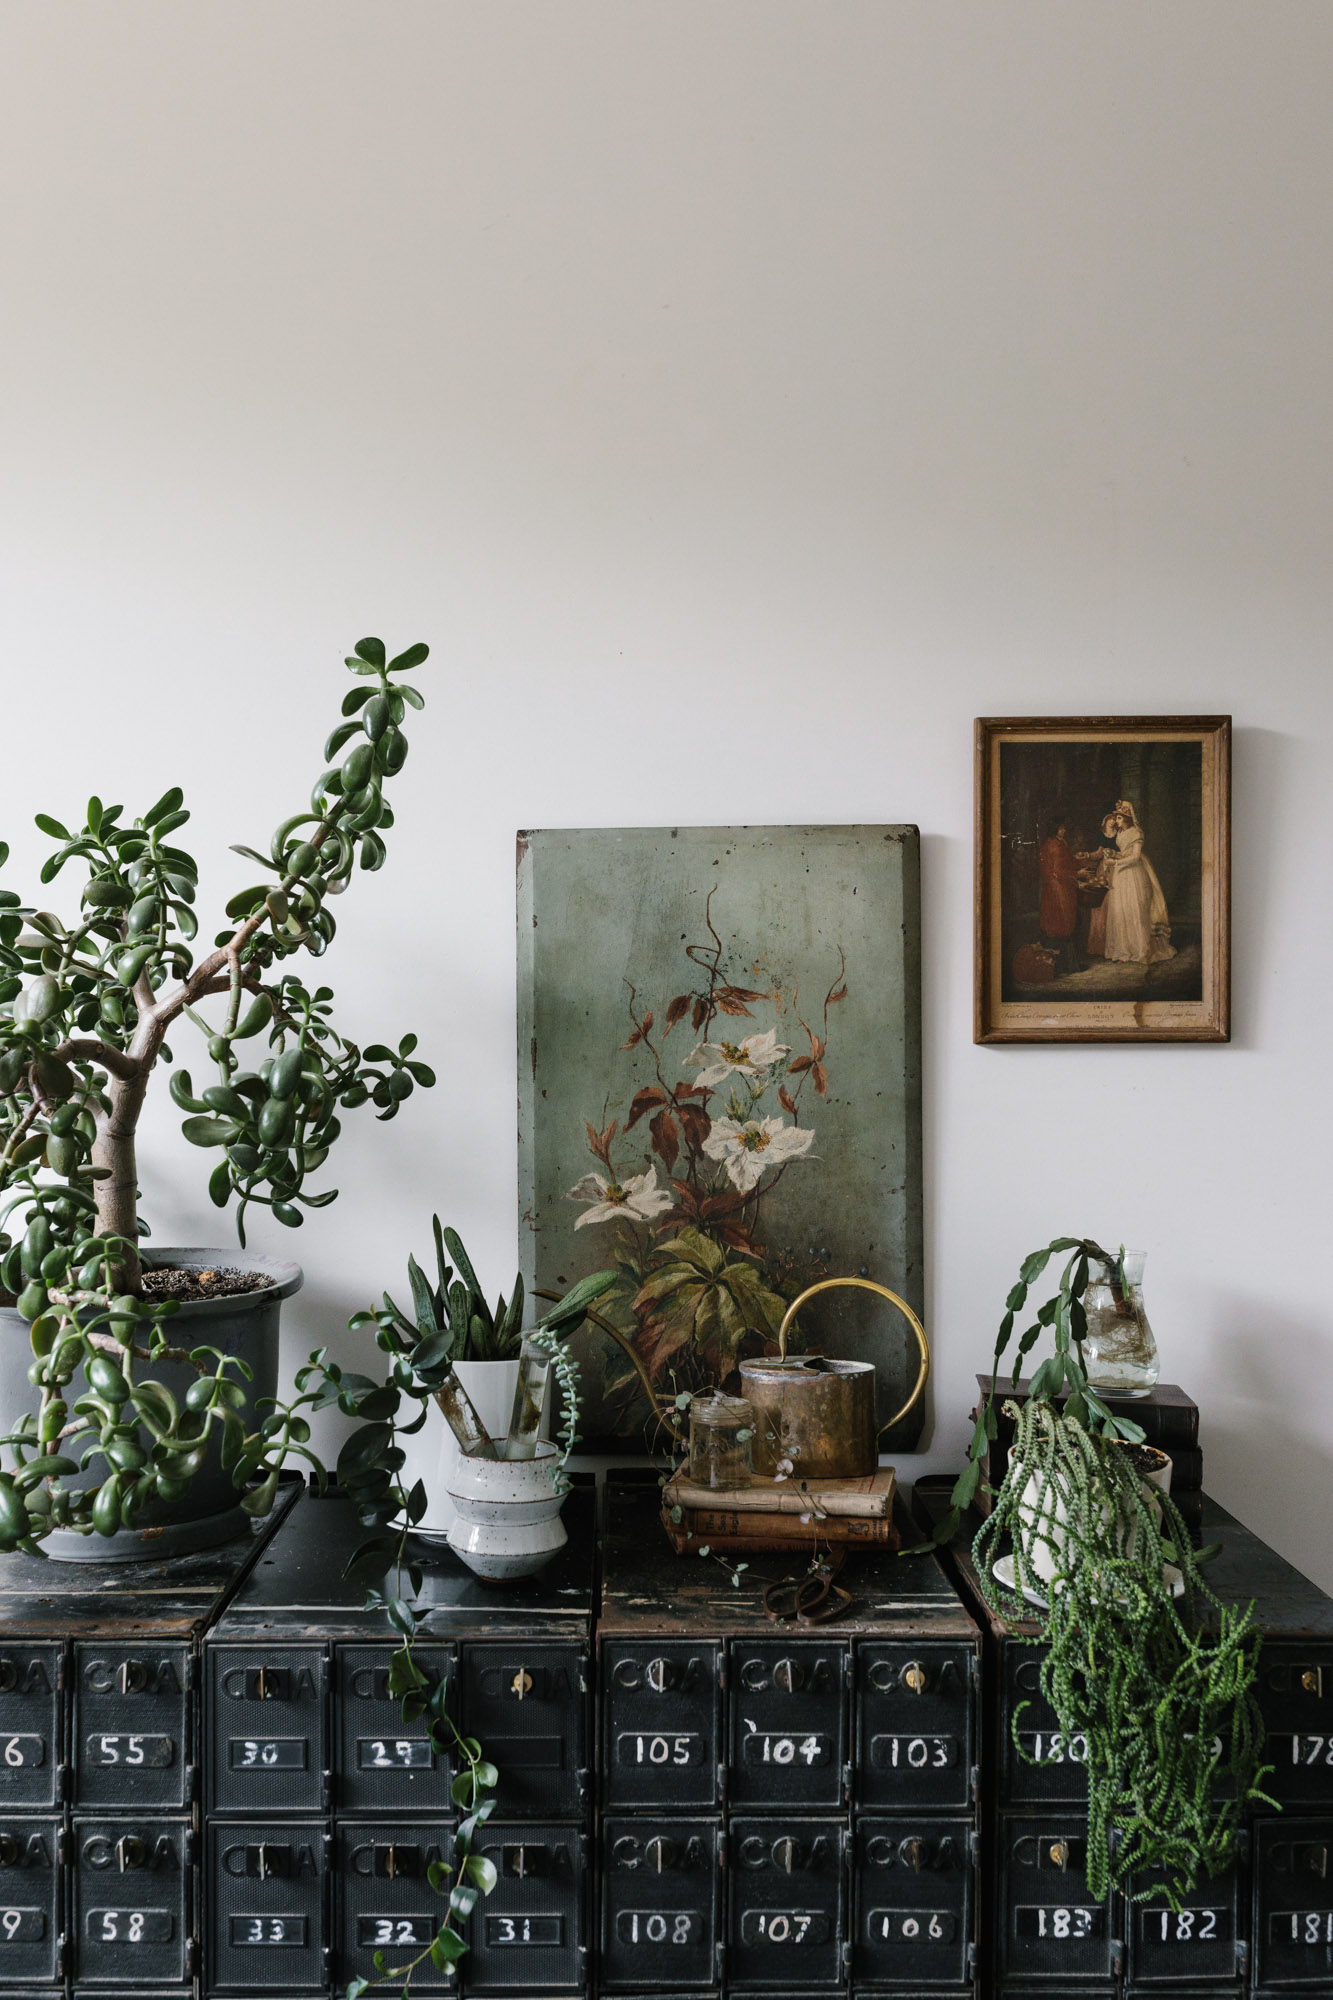 Marnie Hawson, Melbourne purpose-driven interior photographer for Country Style magazine